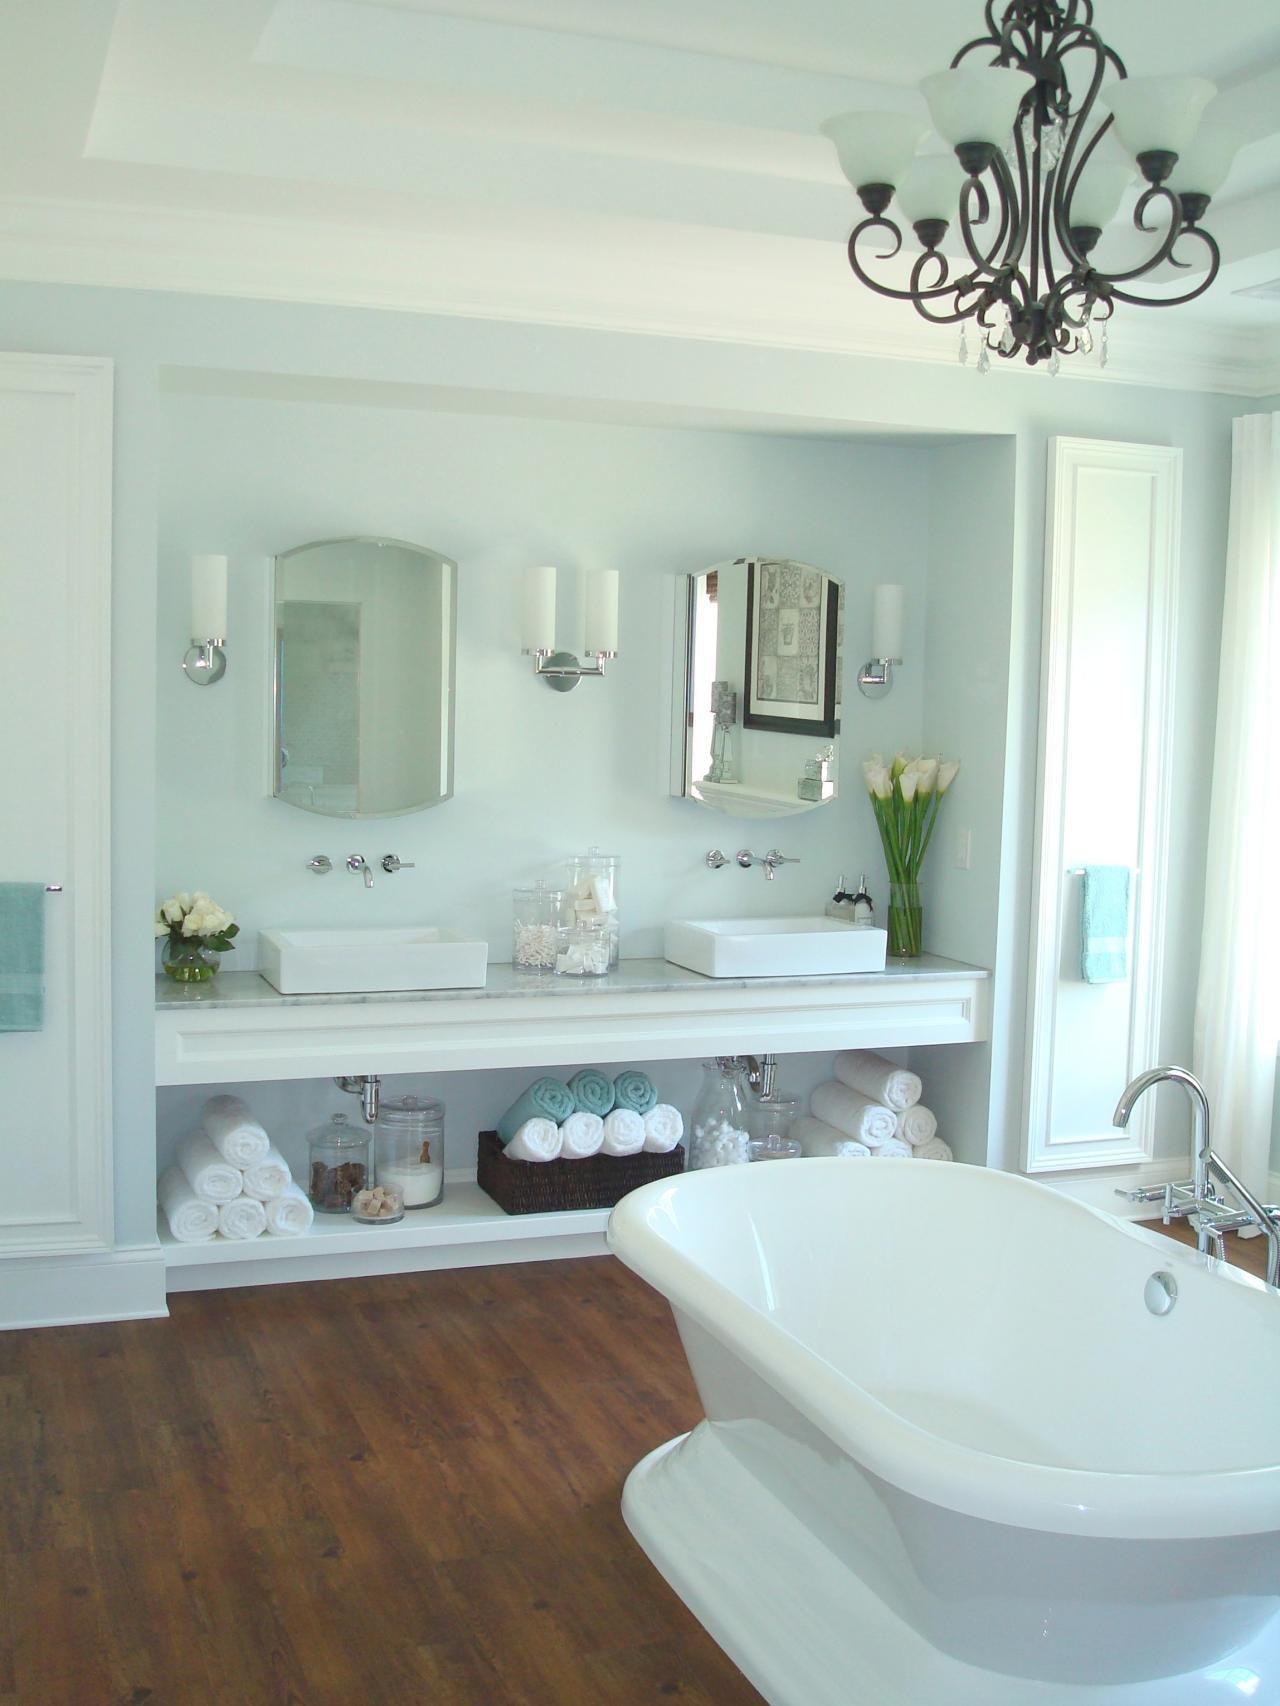 Bathroom Vanities for Any Style | Pinterest | Bathroom vanities ...